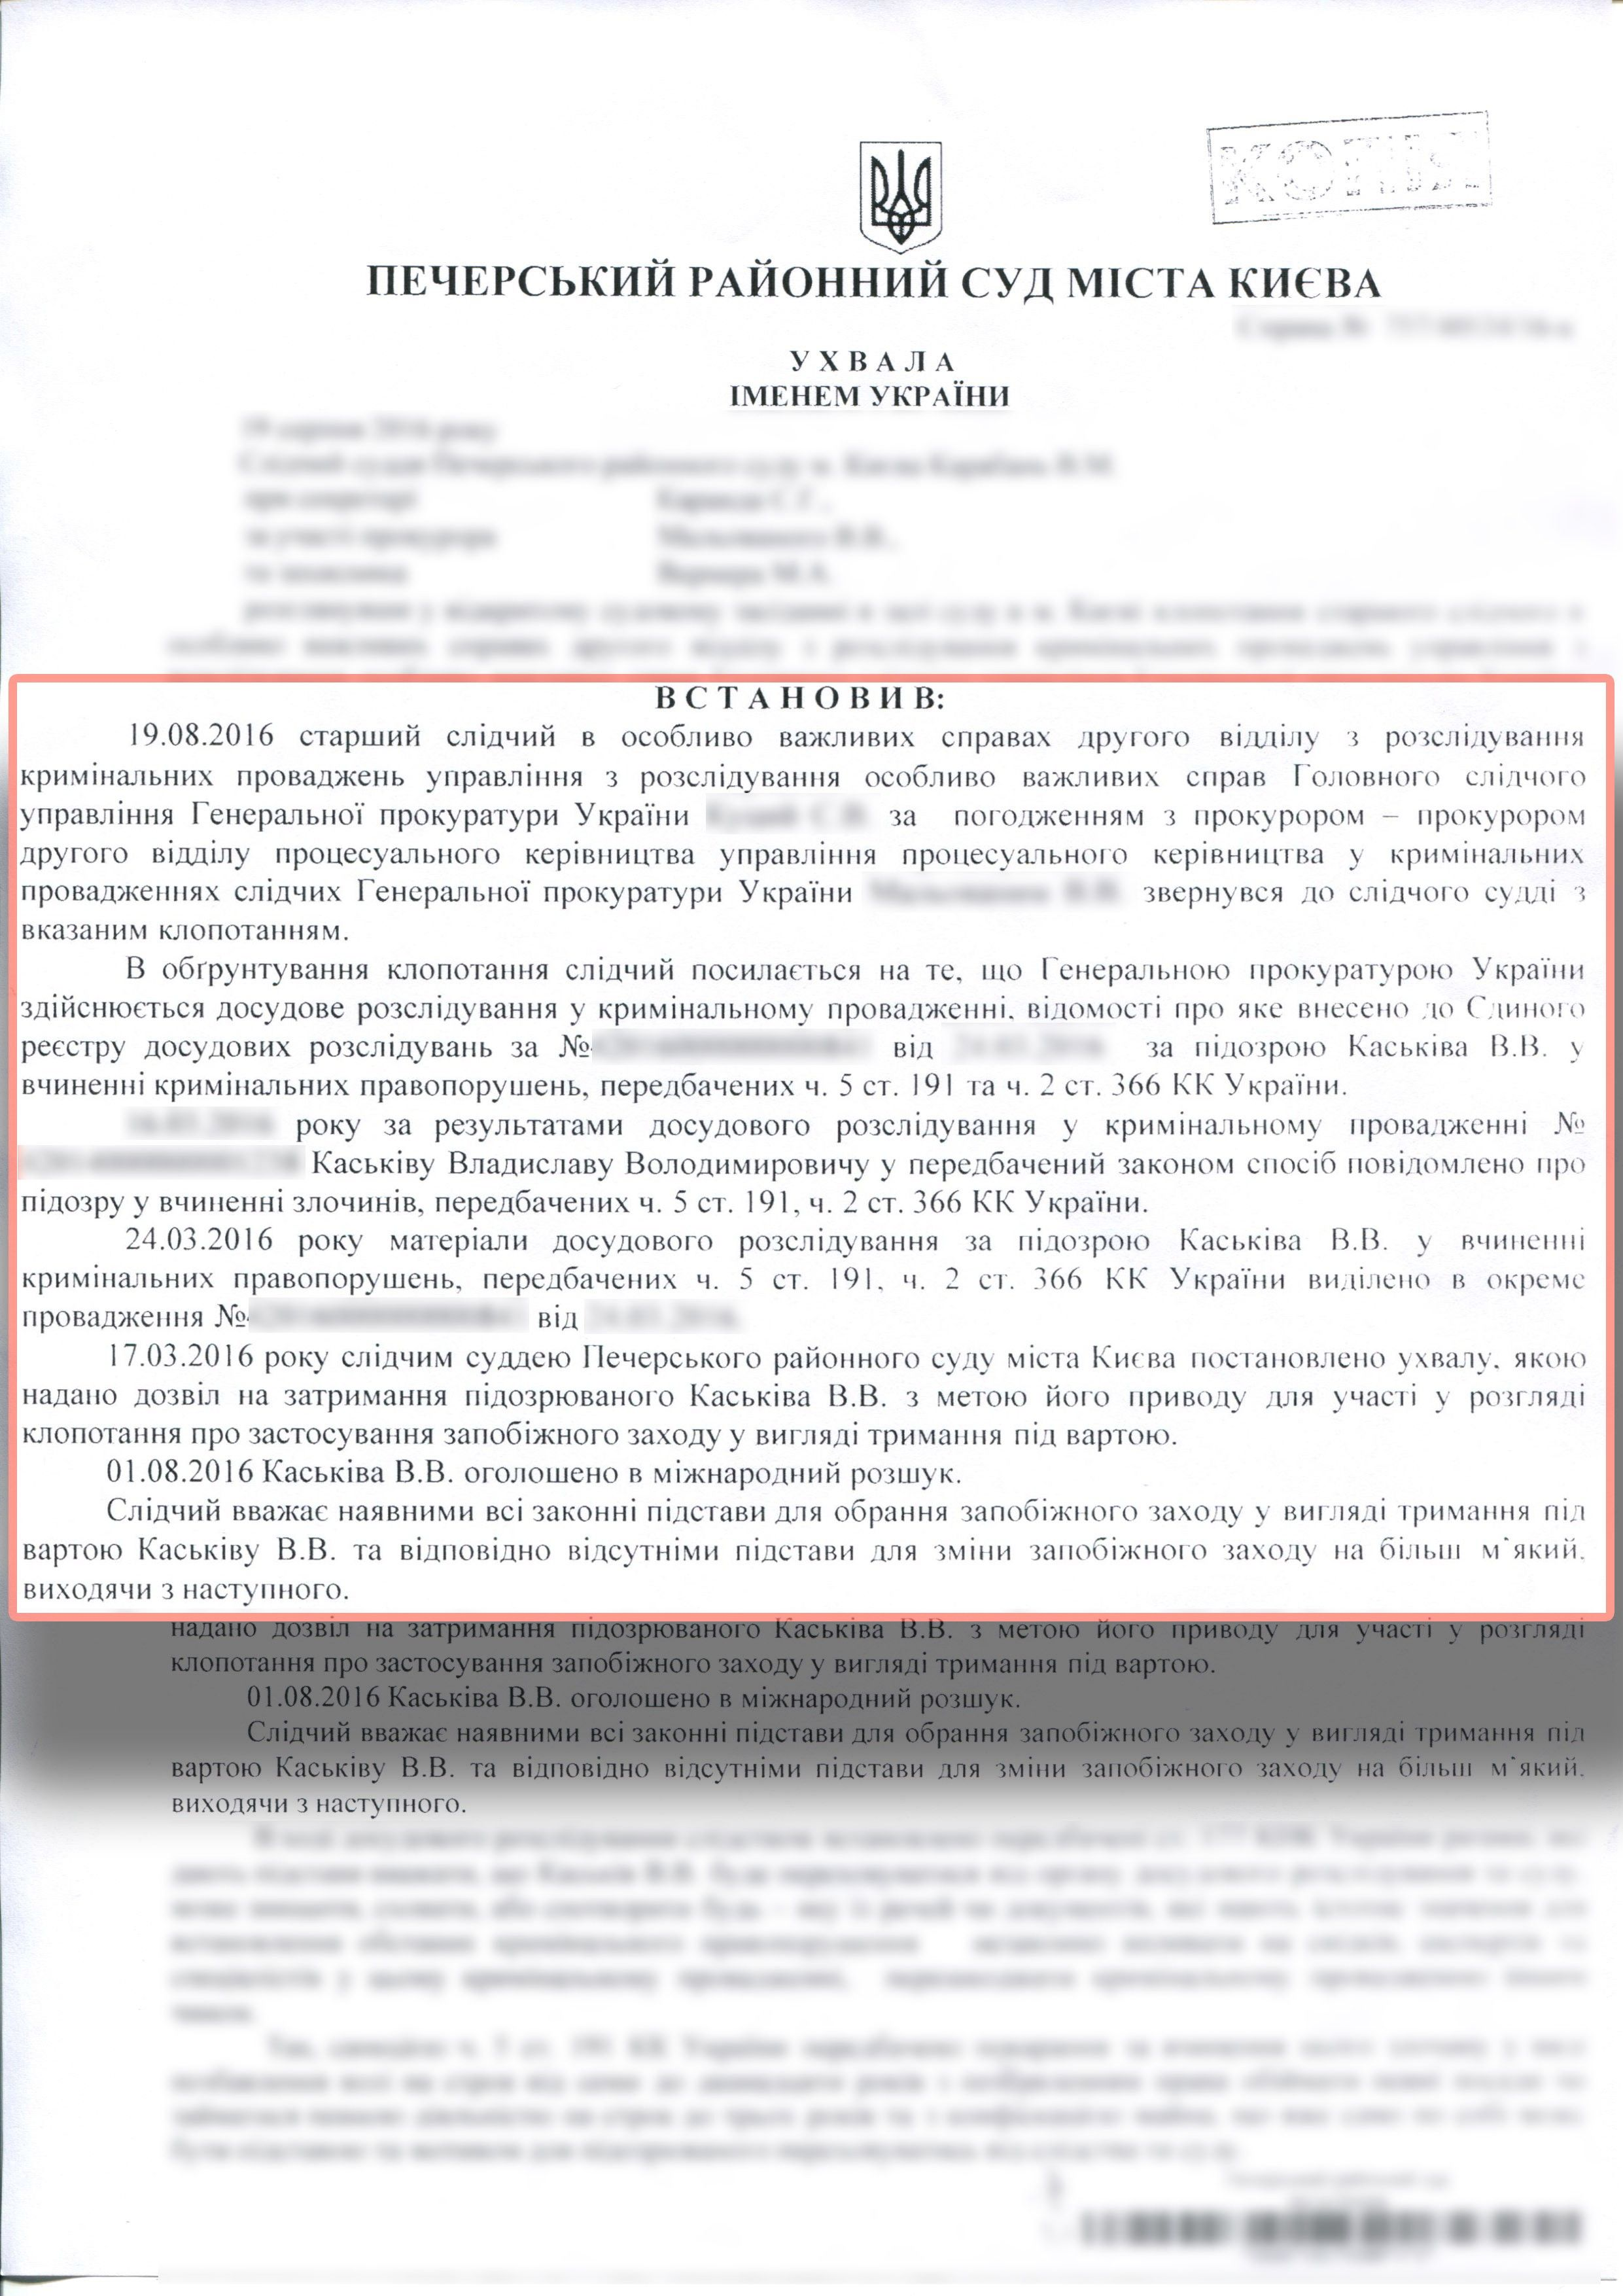 A Kyiv court ruling on Kaskiv / Image from gp.gov.ua